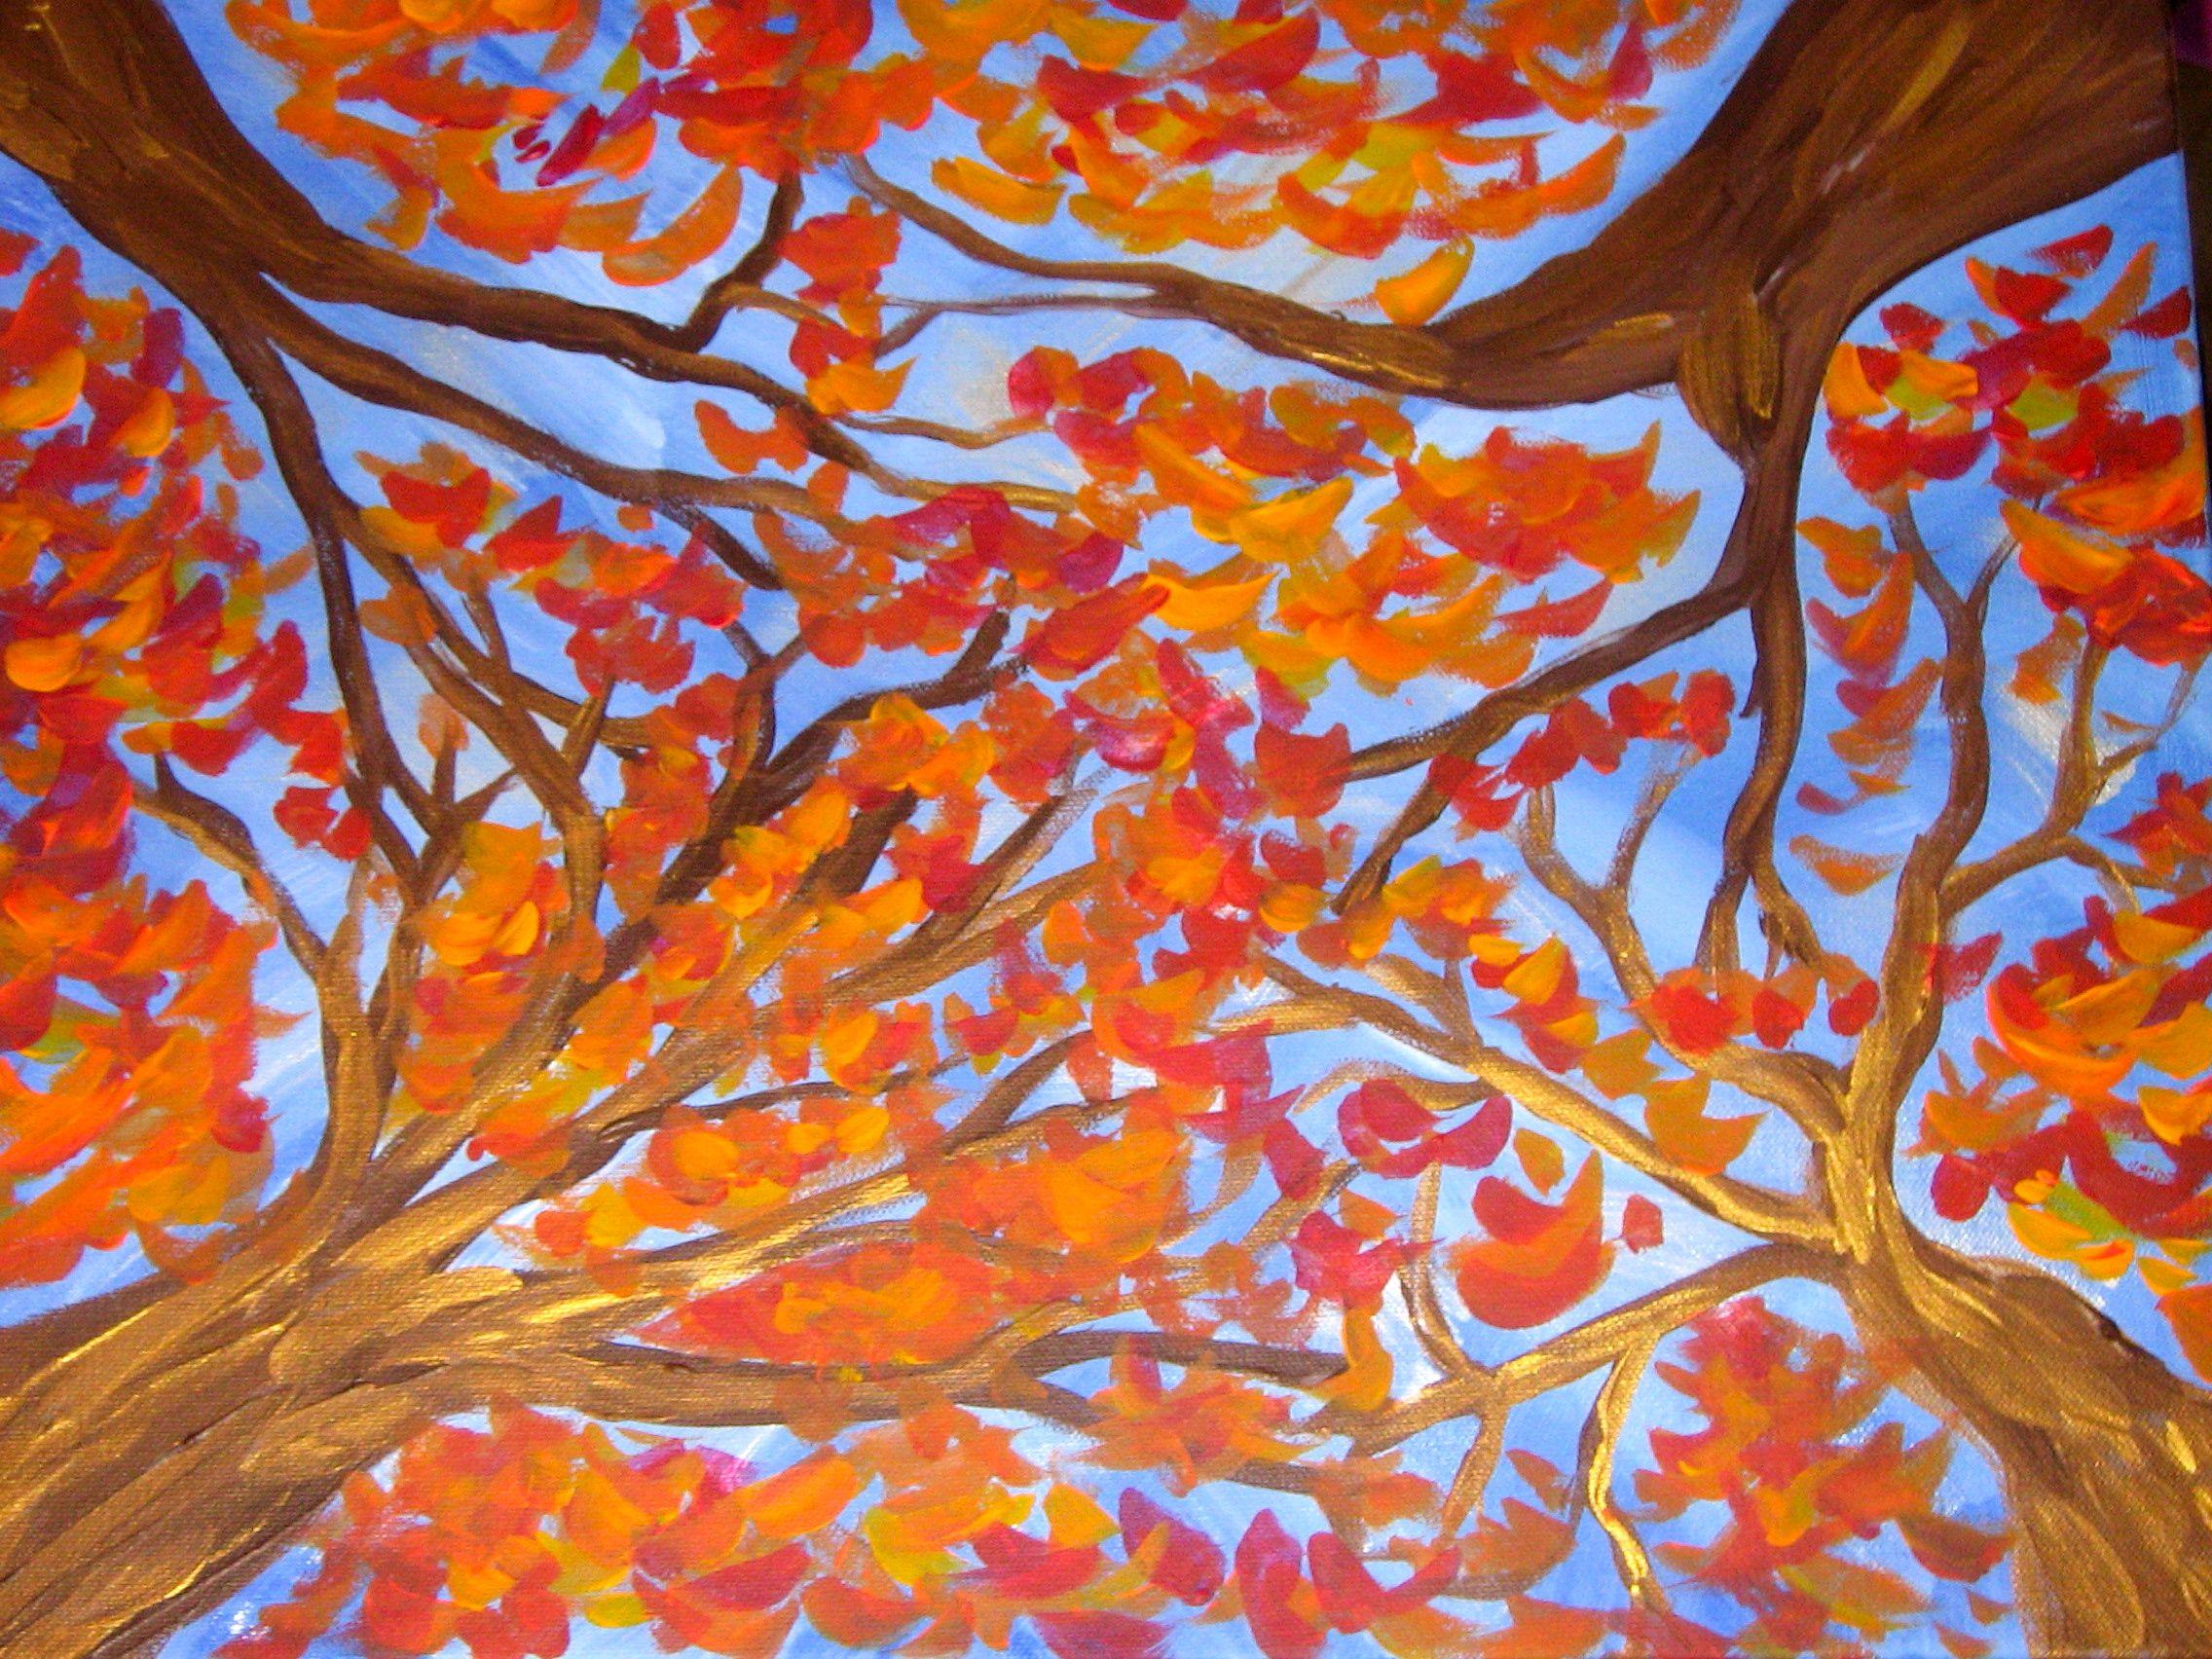 Fall Art Projects - Fall Scene For 4 Seasons Series